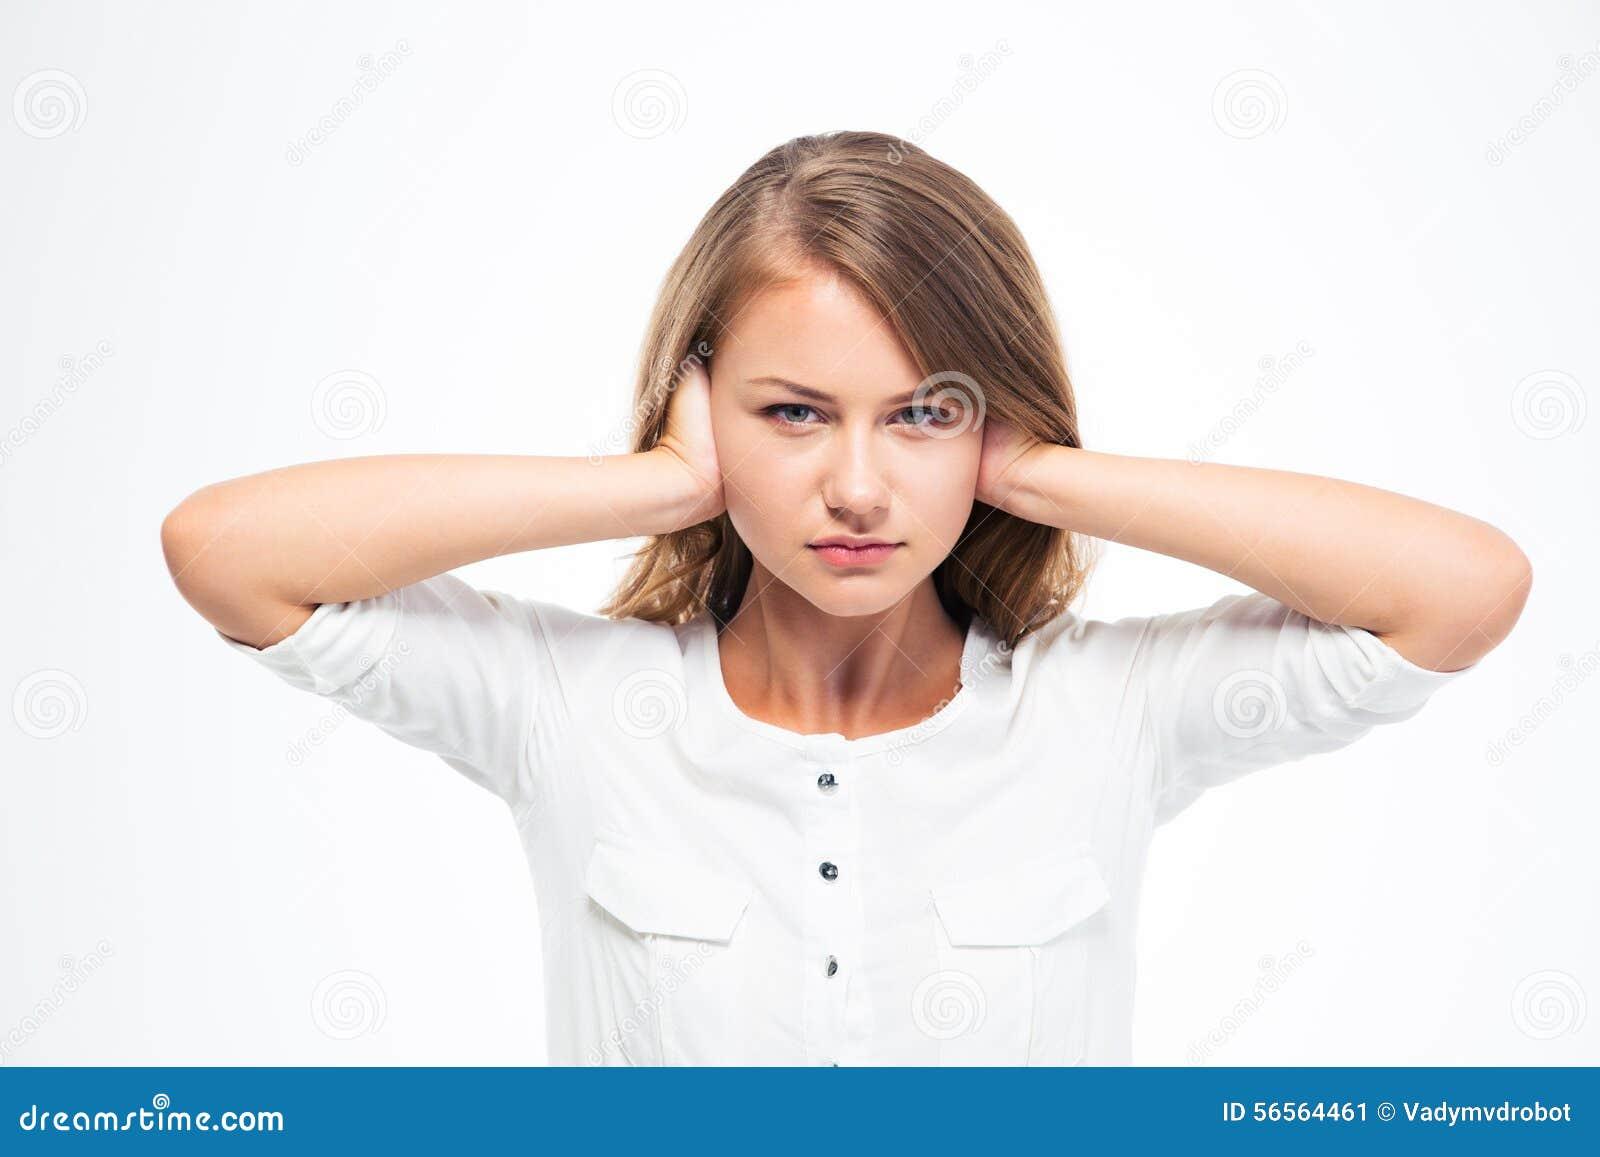 Download Νέα όμορφη γυναίκα που καλύπτει τα αυτιά της Στοκ Εικόνα - εικόνα από φοίνικας, απομονωμένος: 56564461